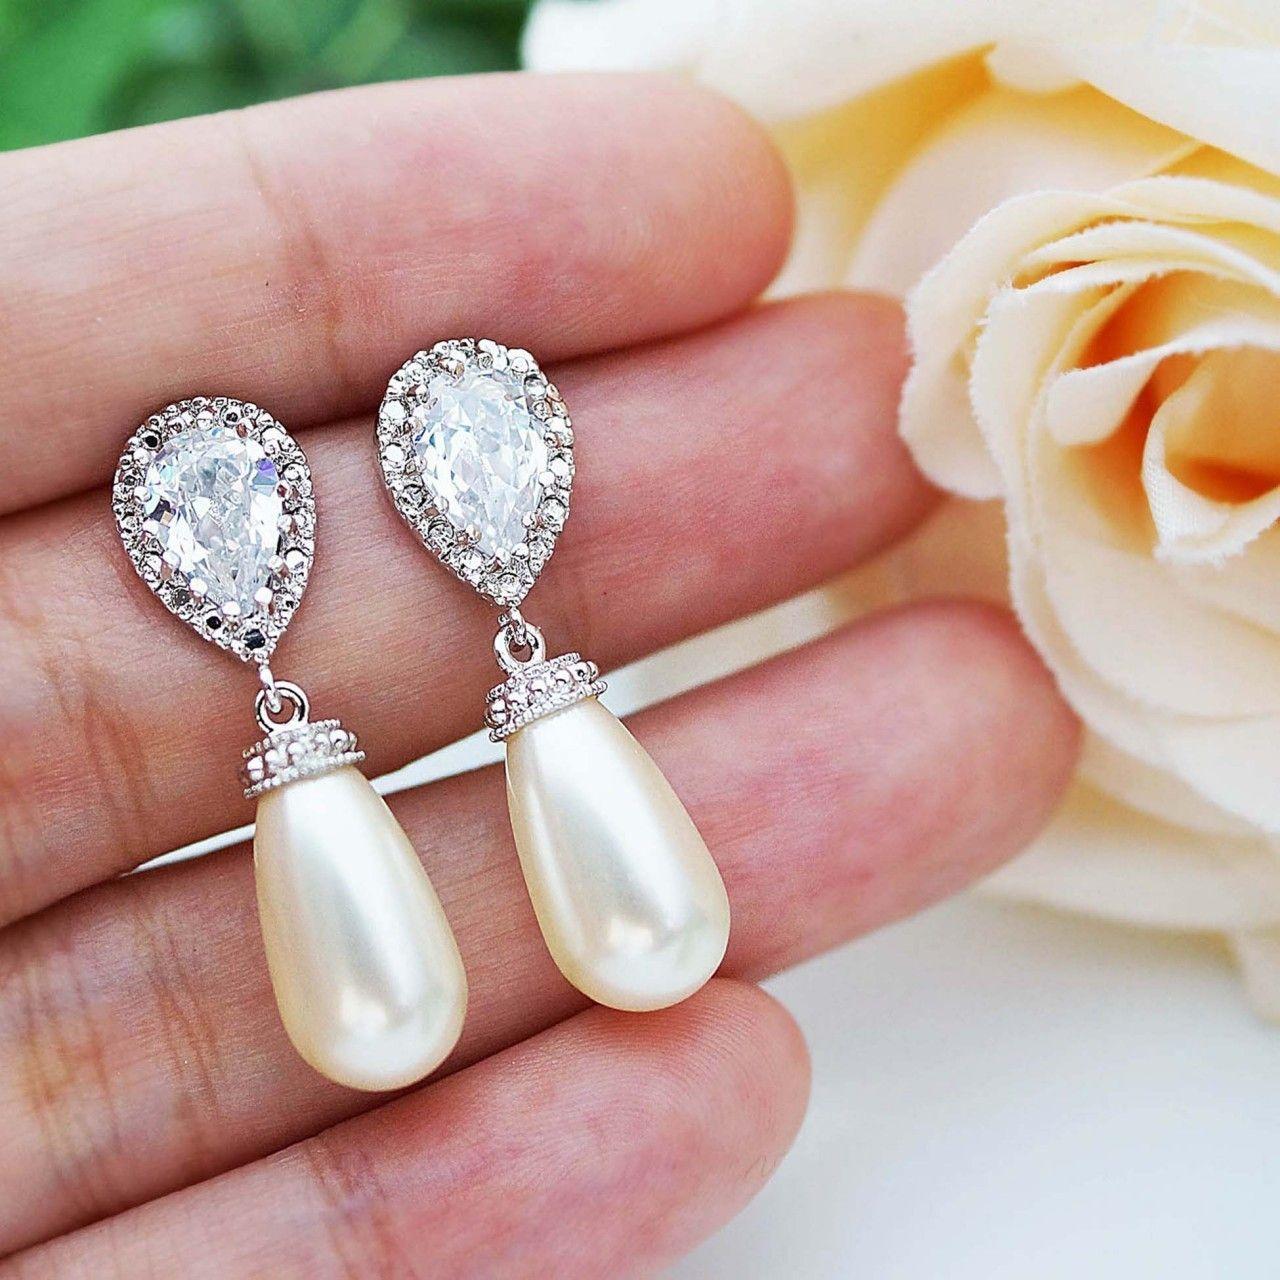 e582e1af5 Swarovski Tear drop pearls Bridal Earrings | September 2016 ...